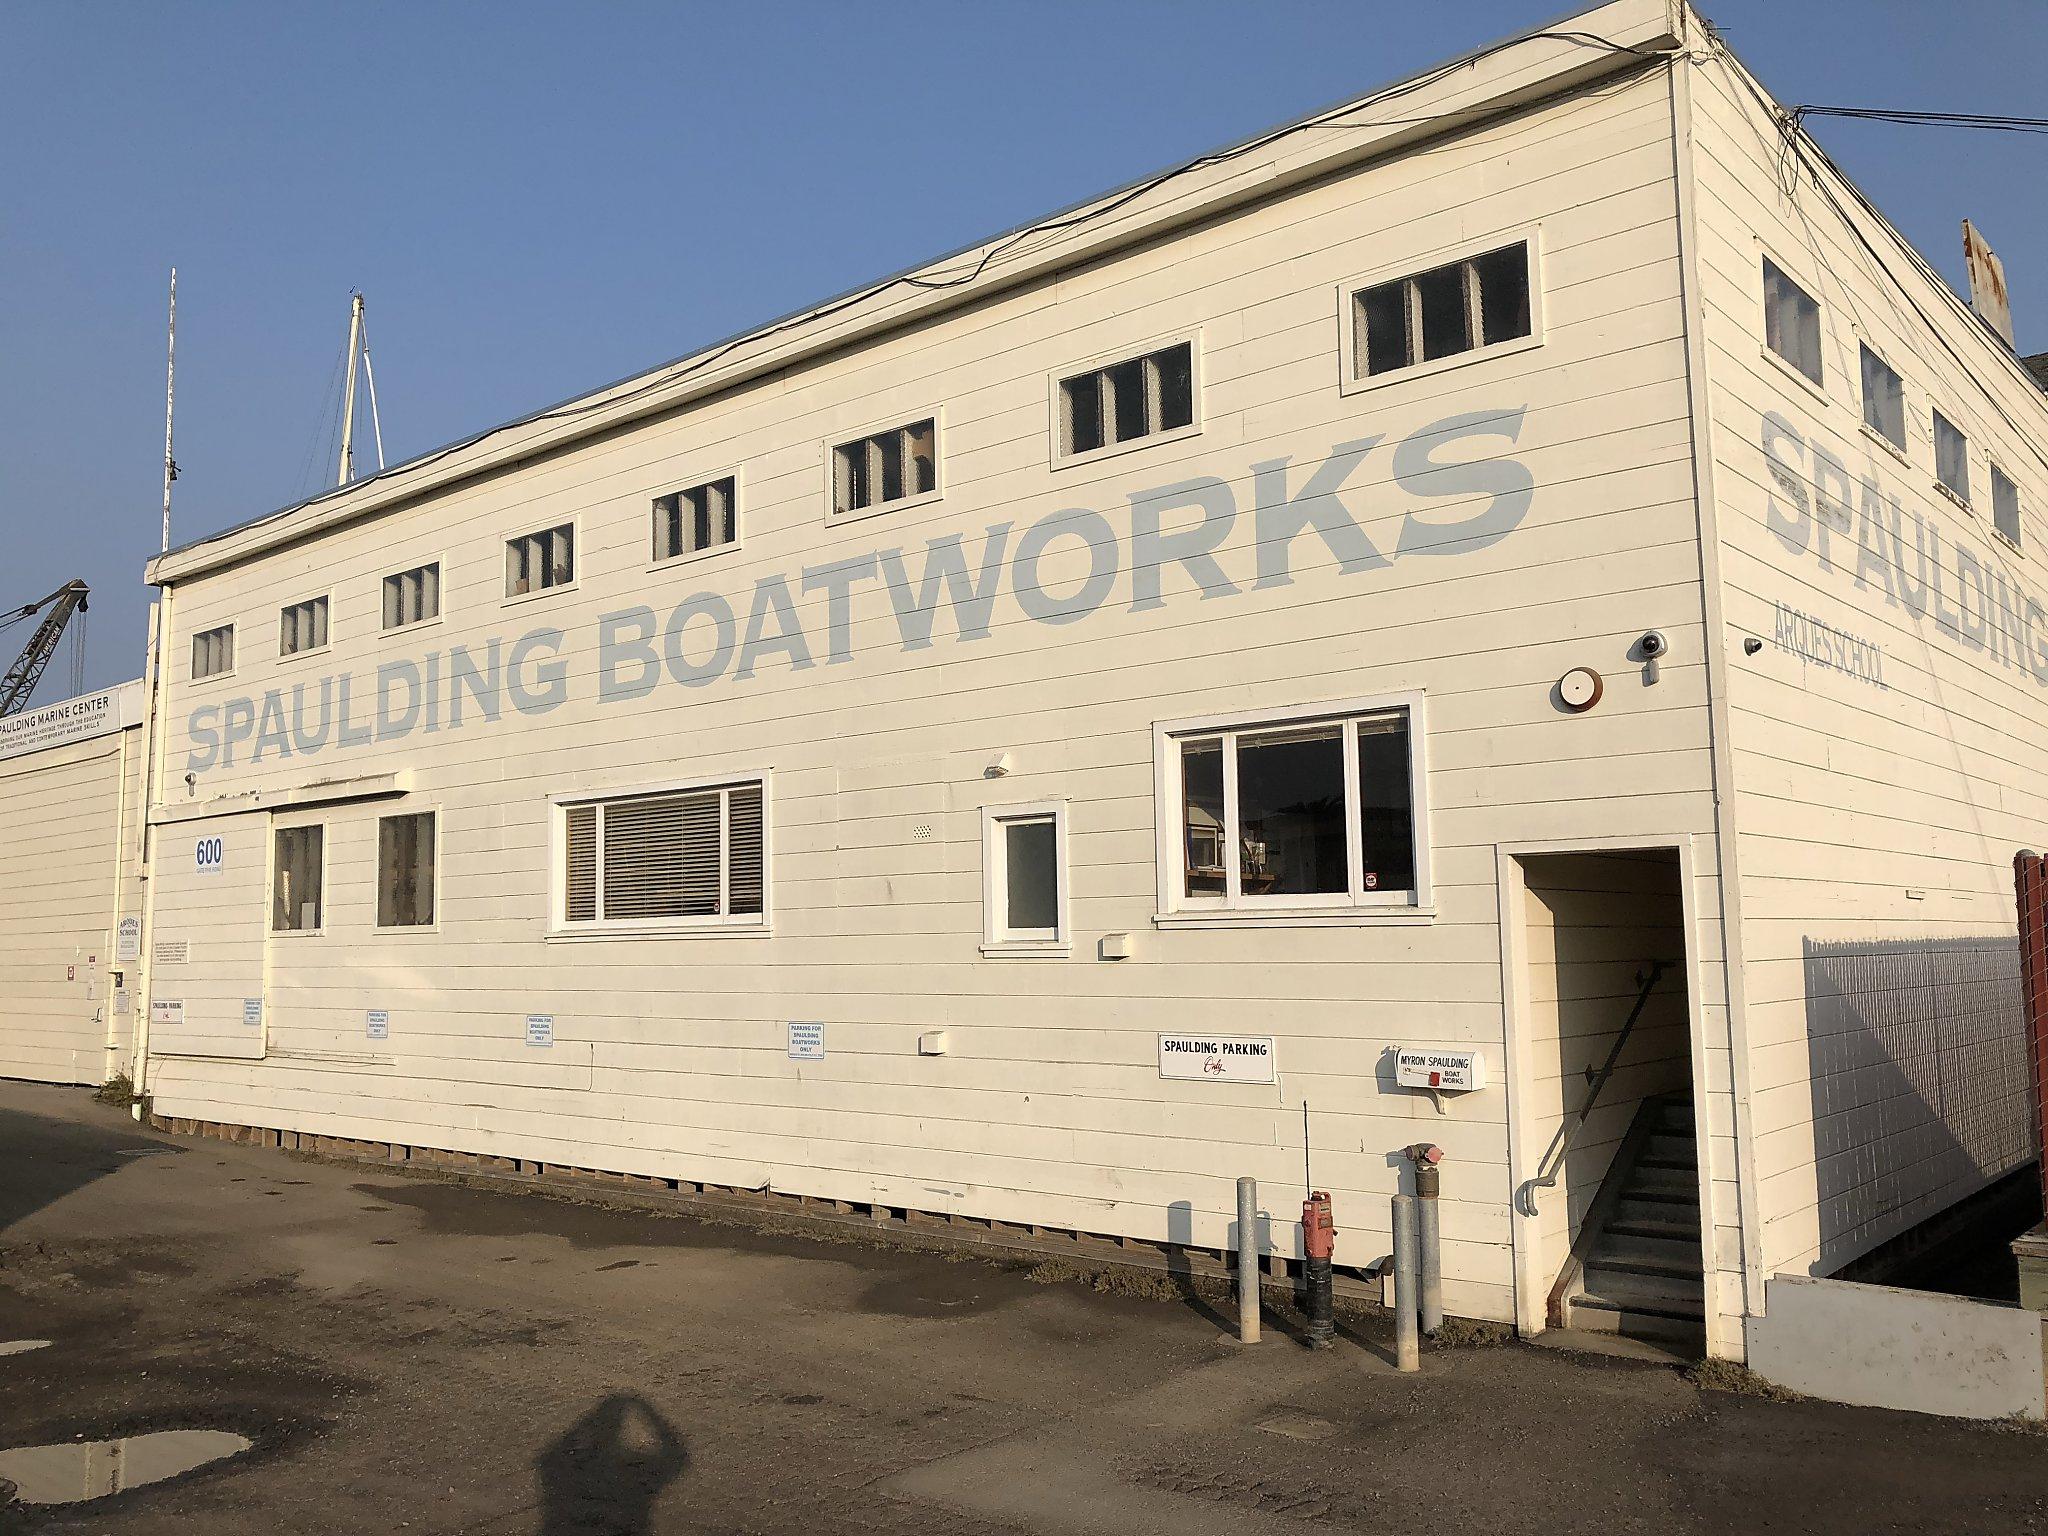 Sausalito affordable housing push for old Marinship shipyard stirs passions